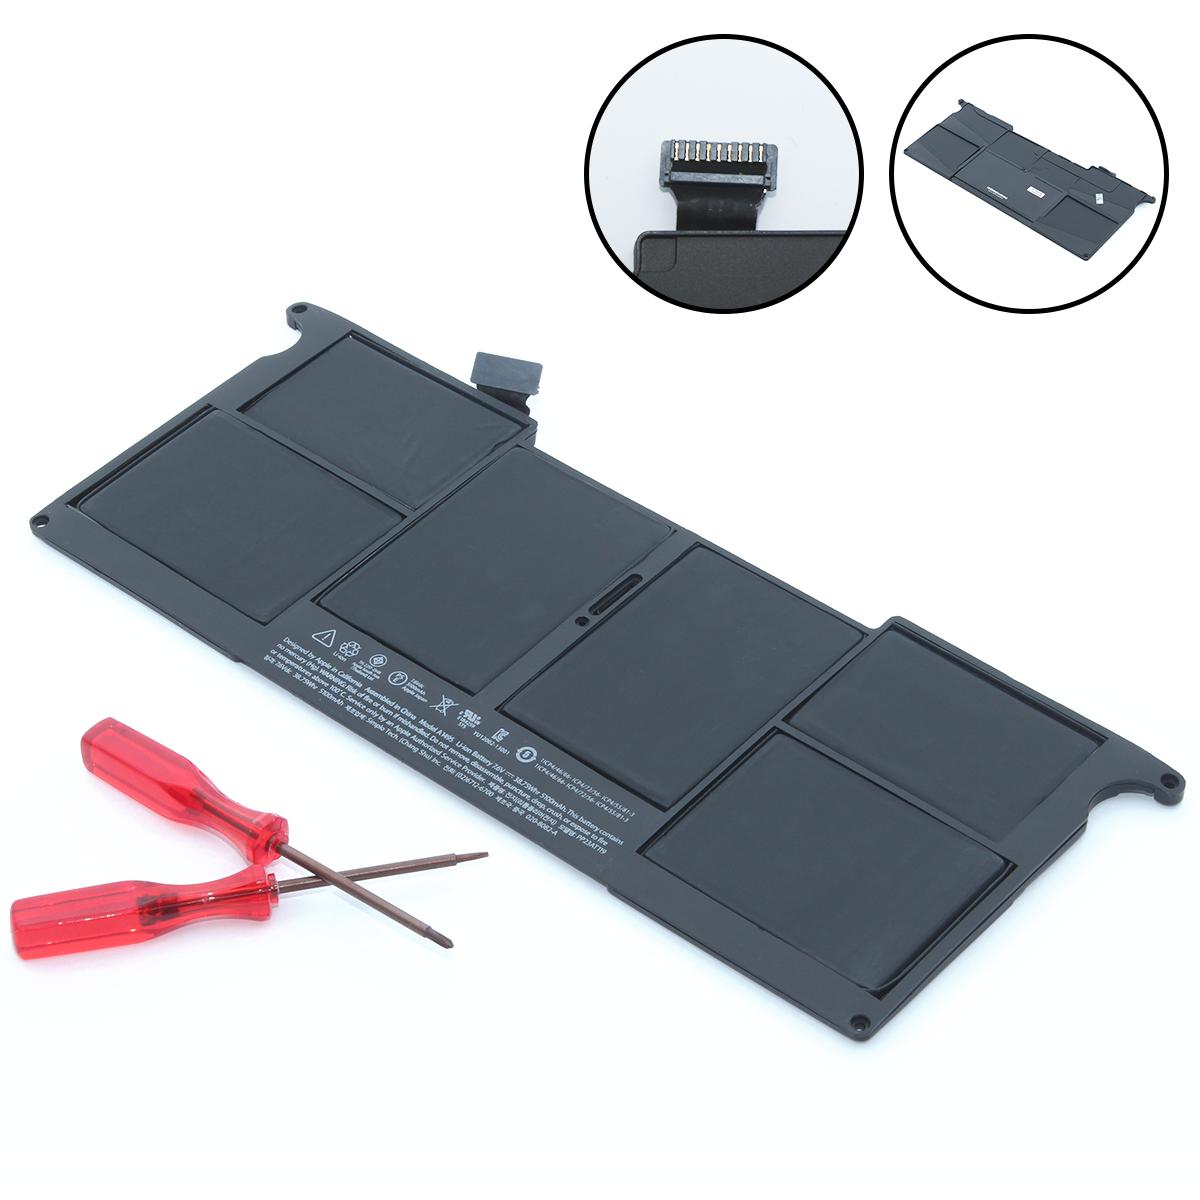 "Батарея, аккумулятор для MacBook Air 11"" 2013-2015 (A1465)"